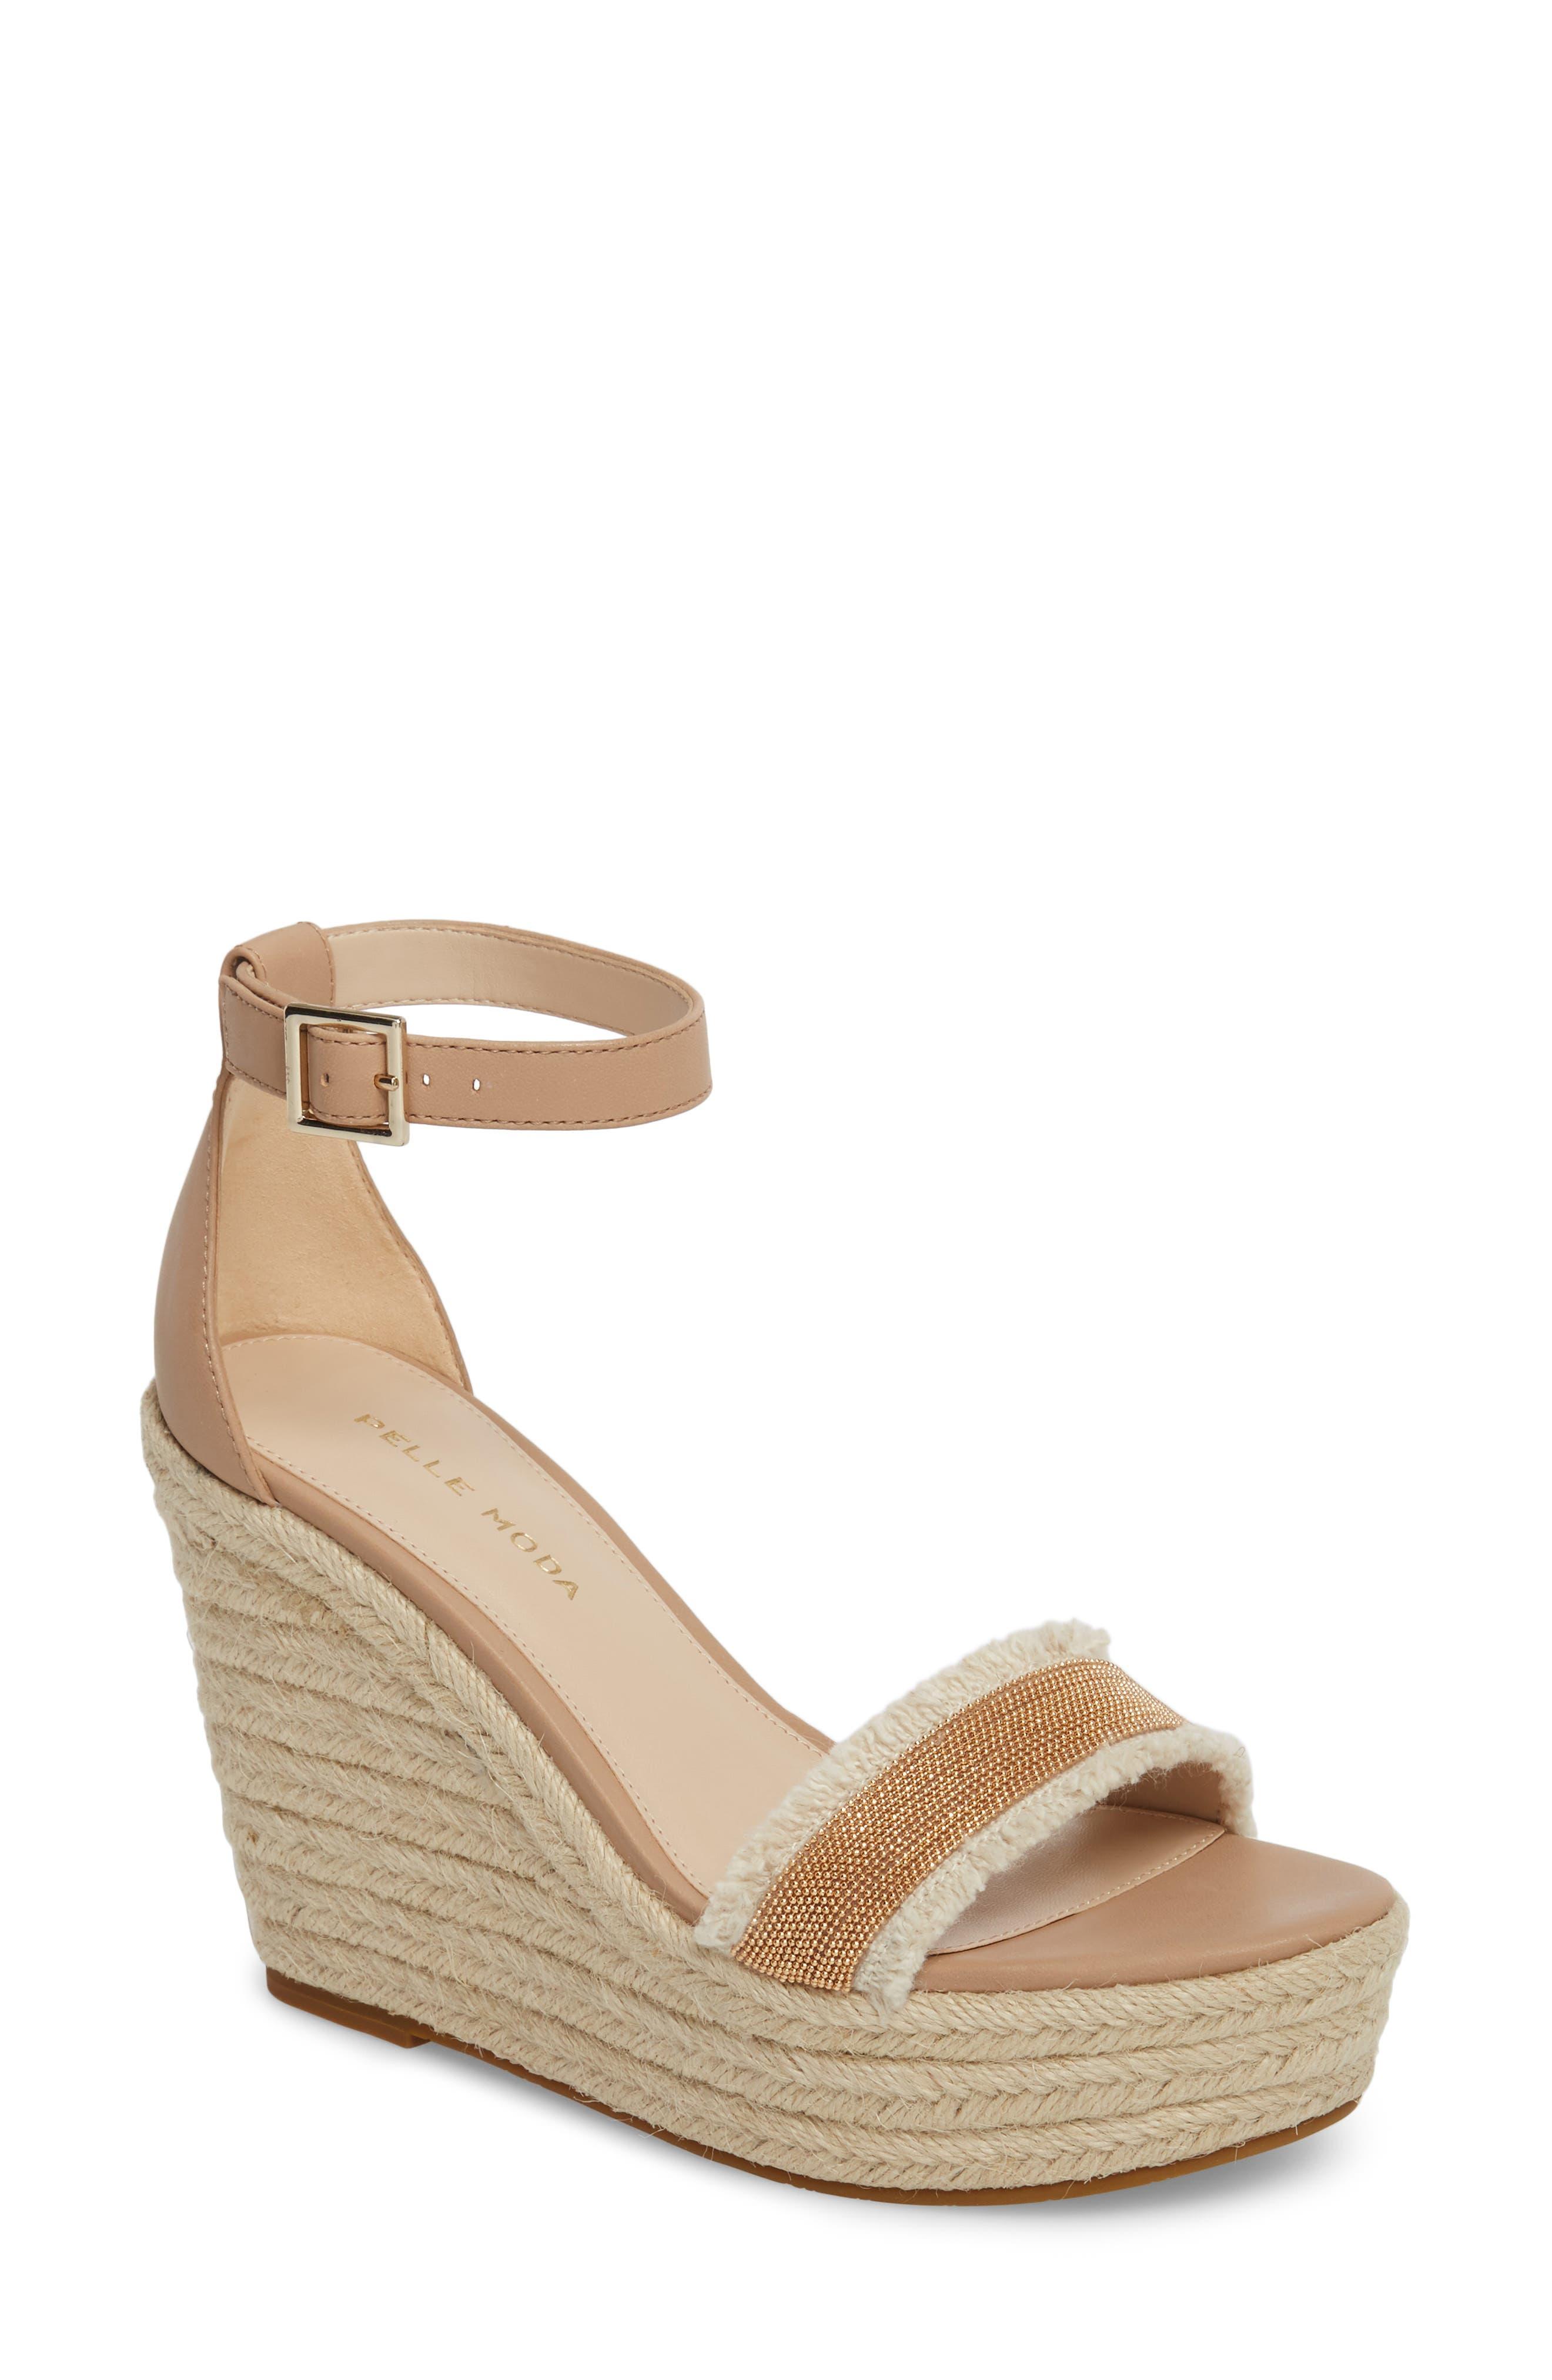 new arrivals Belini Slingback Pump Women Womens Pale Pink Leather Pelle Moda Womens Shoes